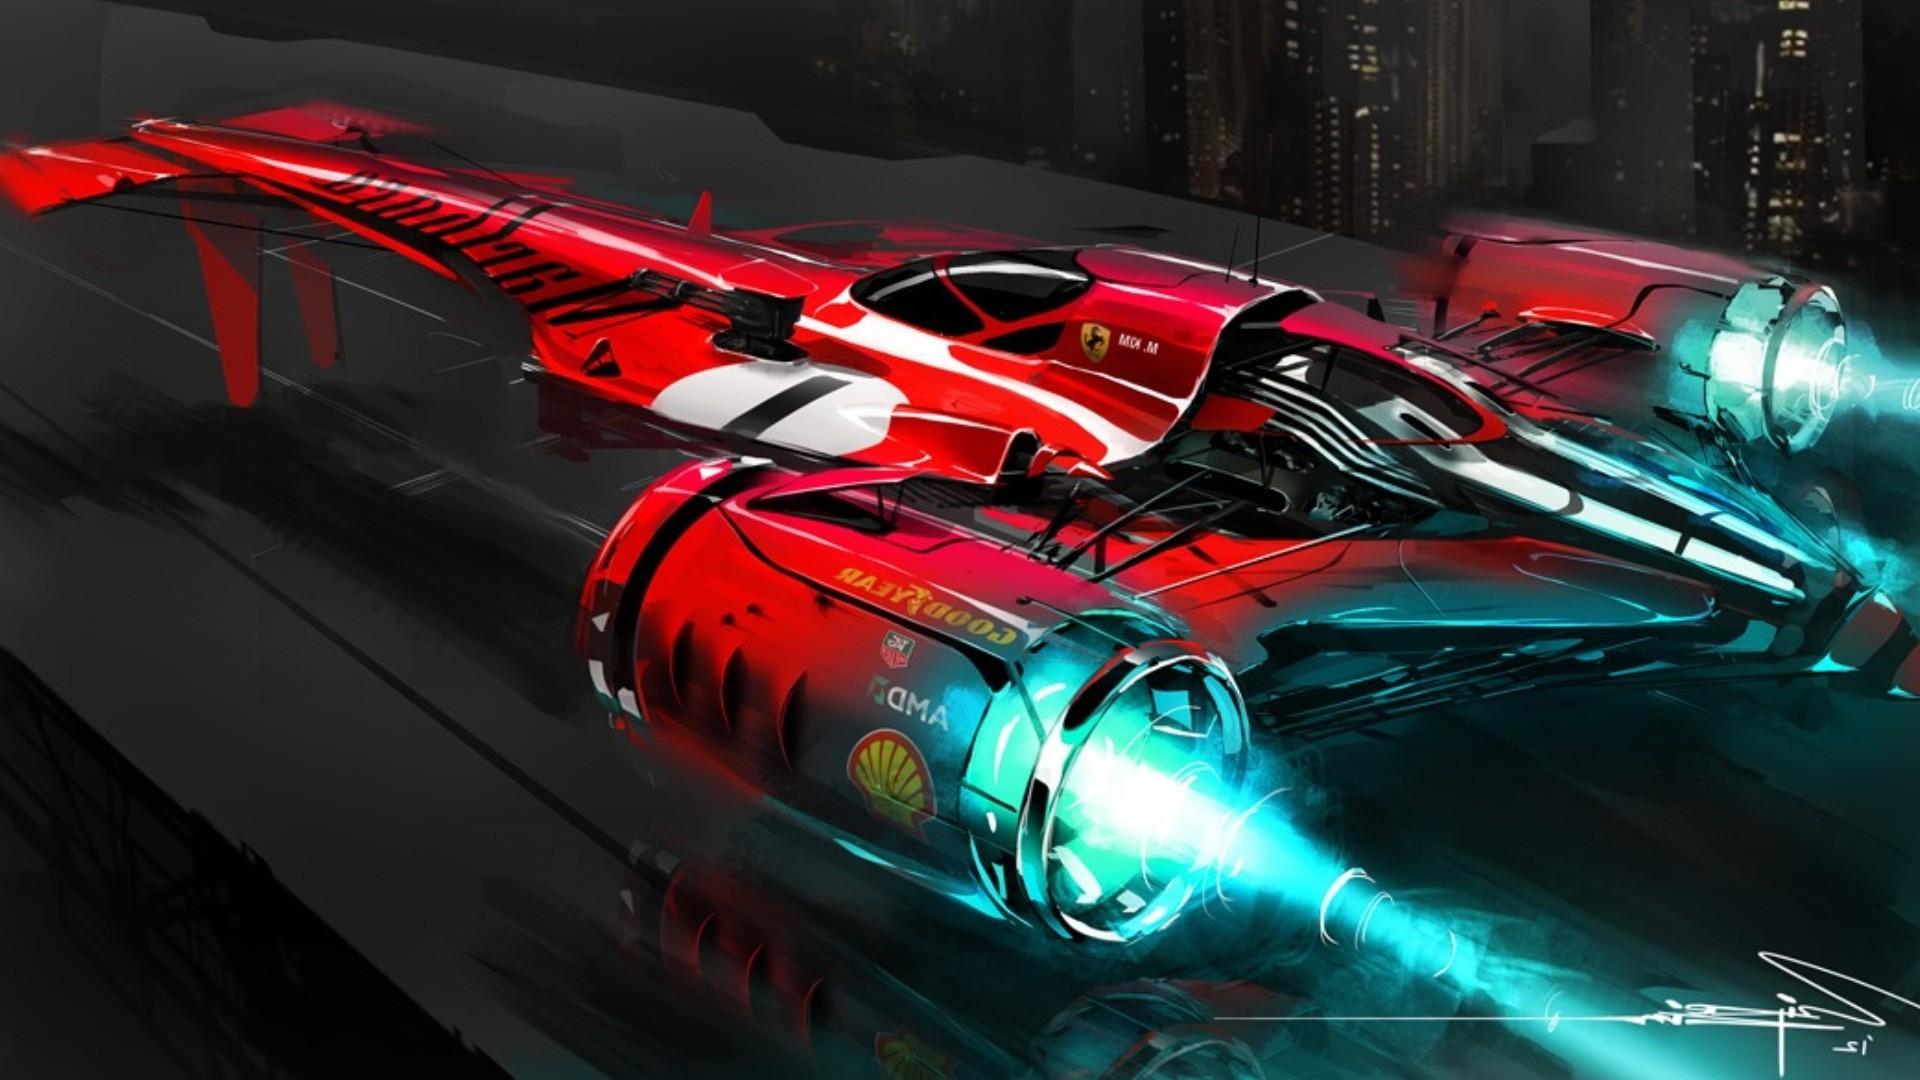 Video Games Car Vehicle Concept Art Sports Car Ferrari Racing Wipeout  Supercar Screenshot 1920x1080 Px Computer